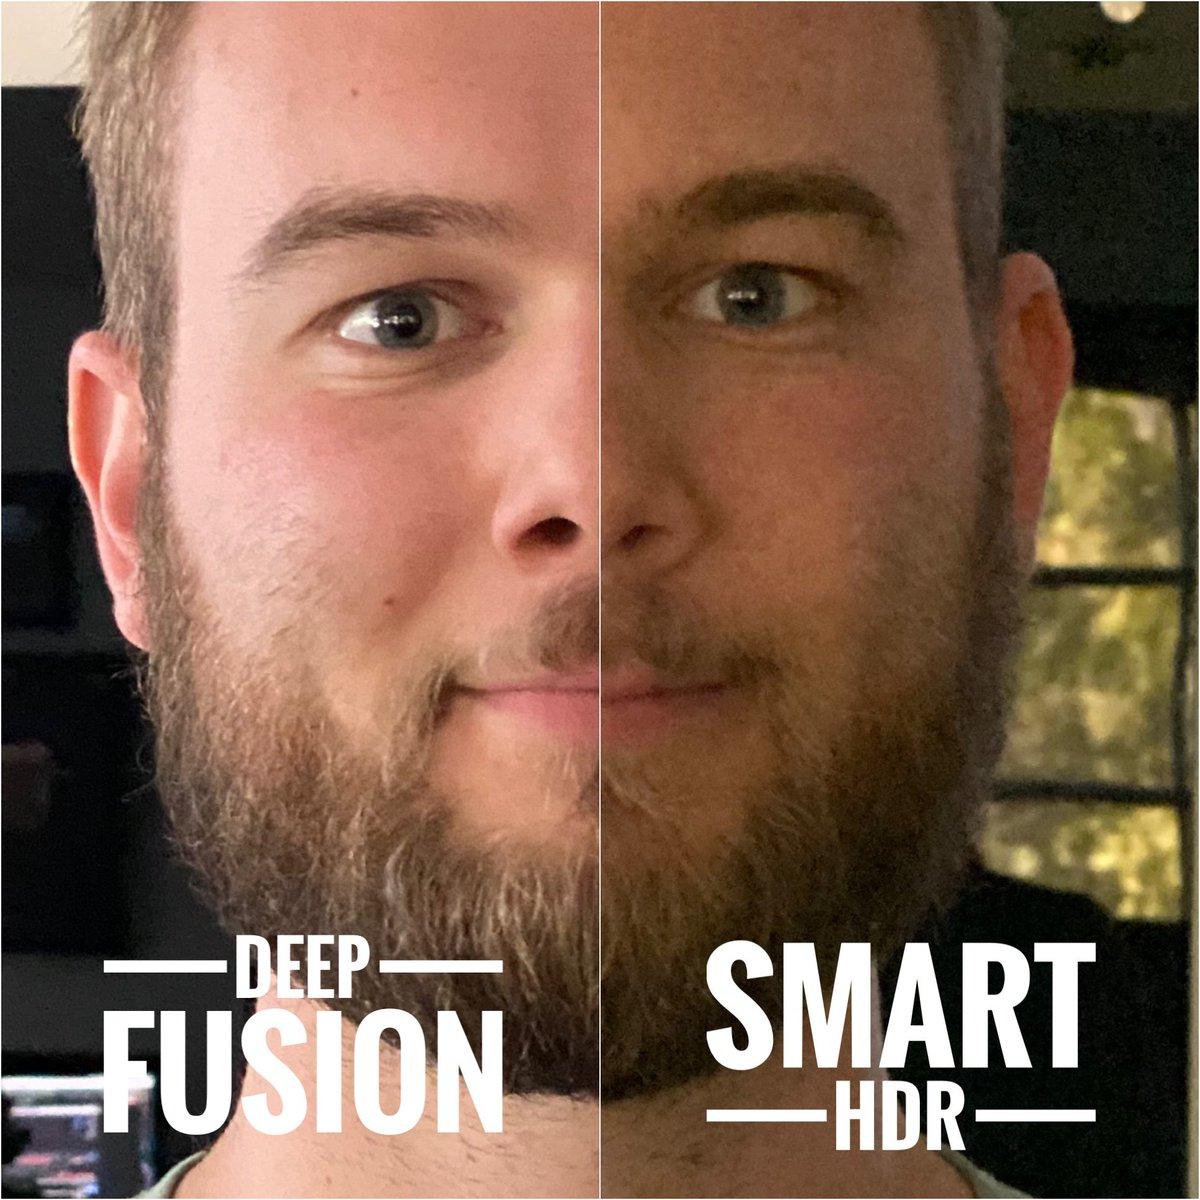 Картинки по запросу deep fusion iphone 11